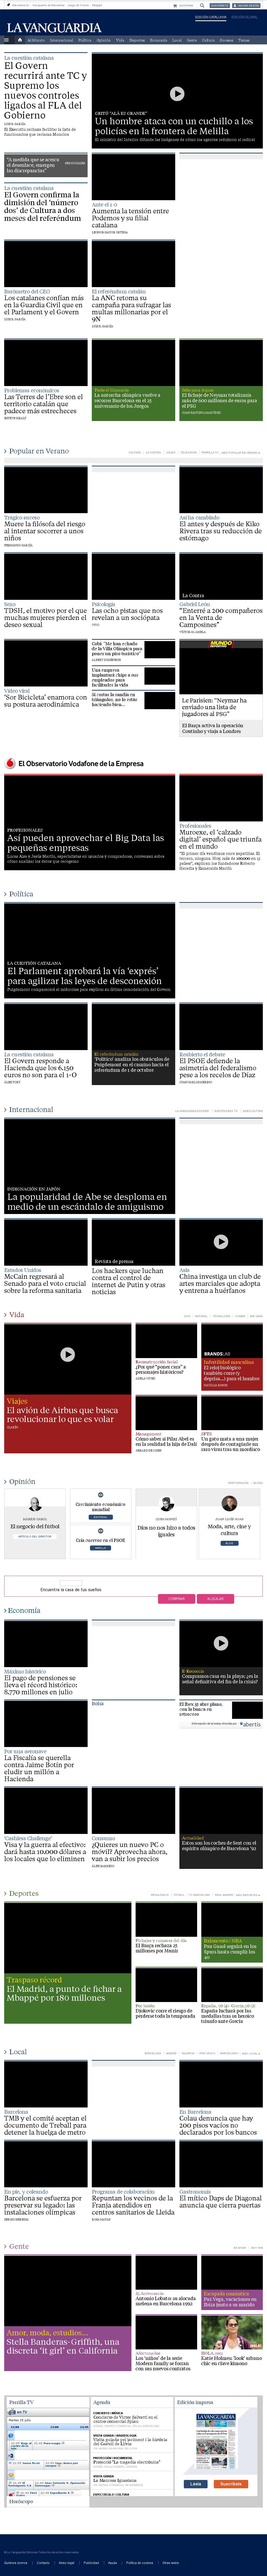 La Vanguardia at Tuesday July 25, 2017, 12:24 p.m. UTC